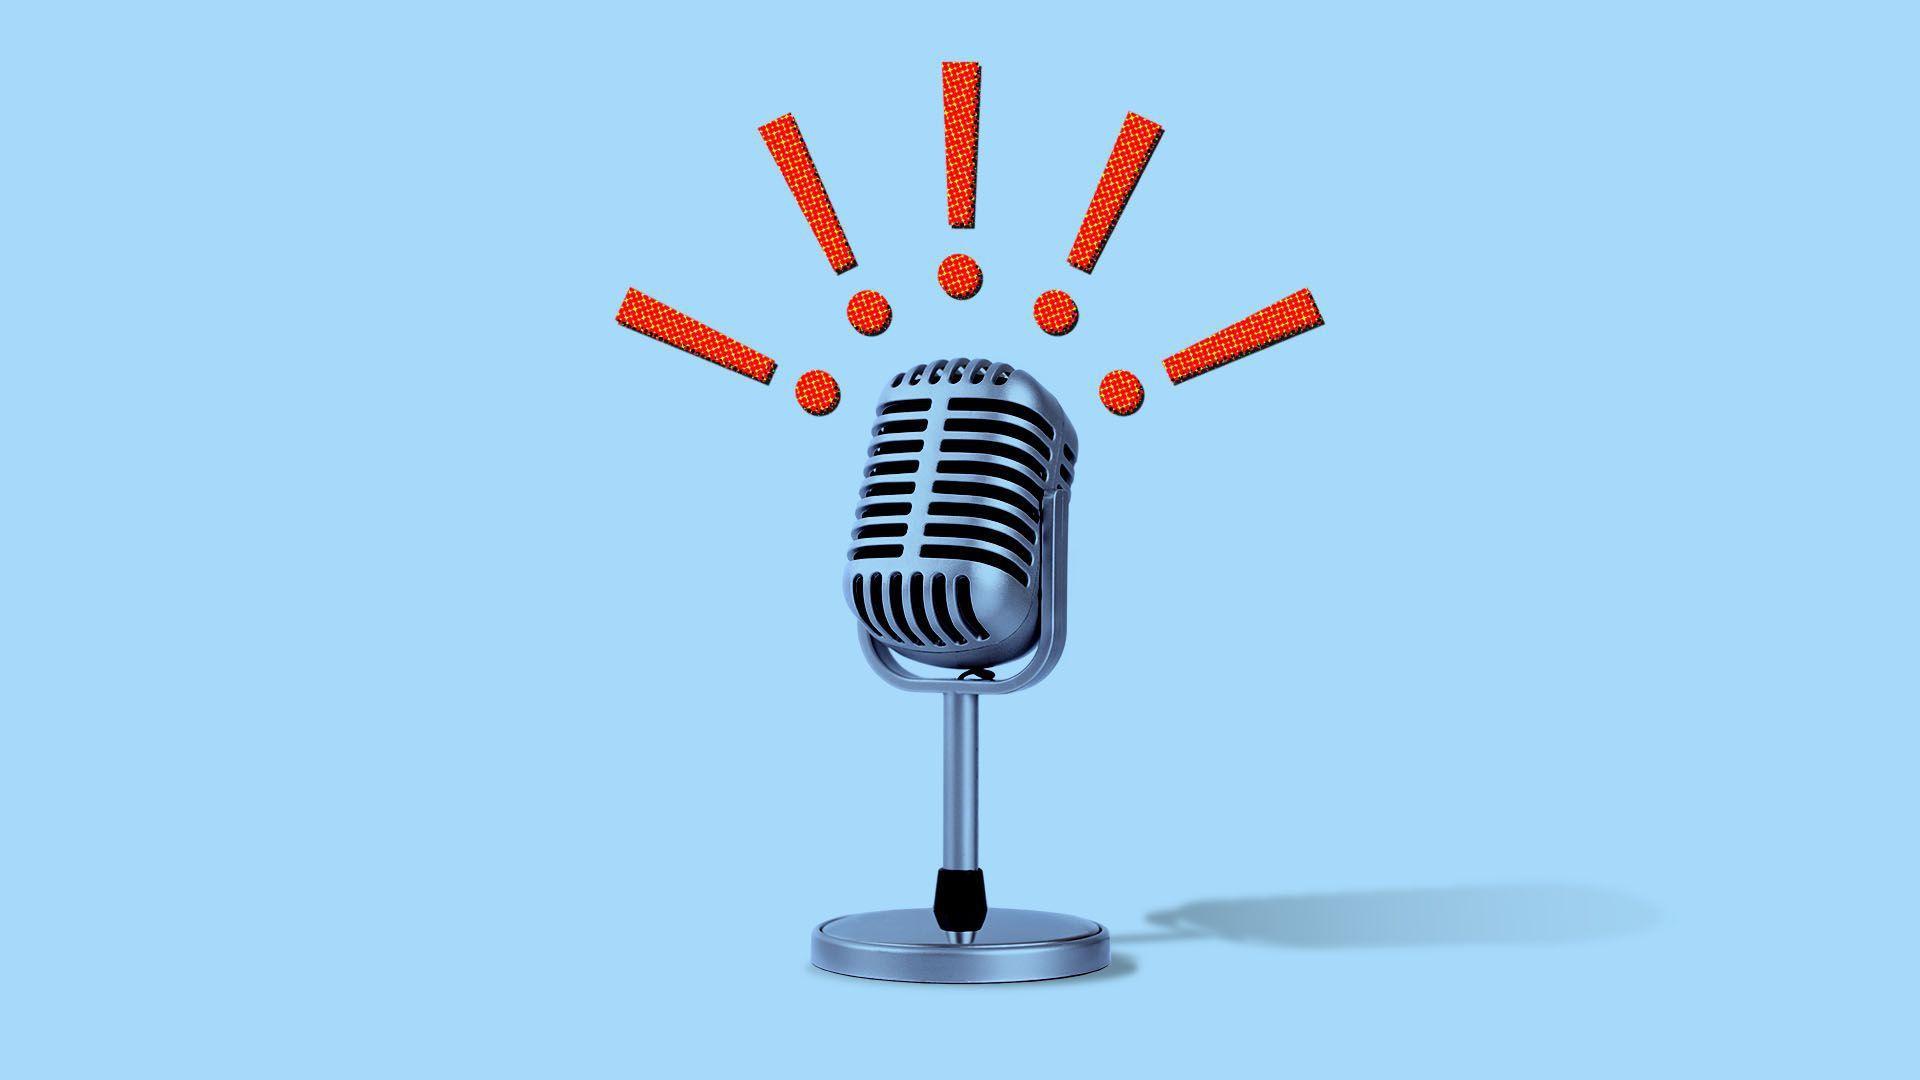 Podcasting's rosy future - Axios